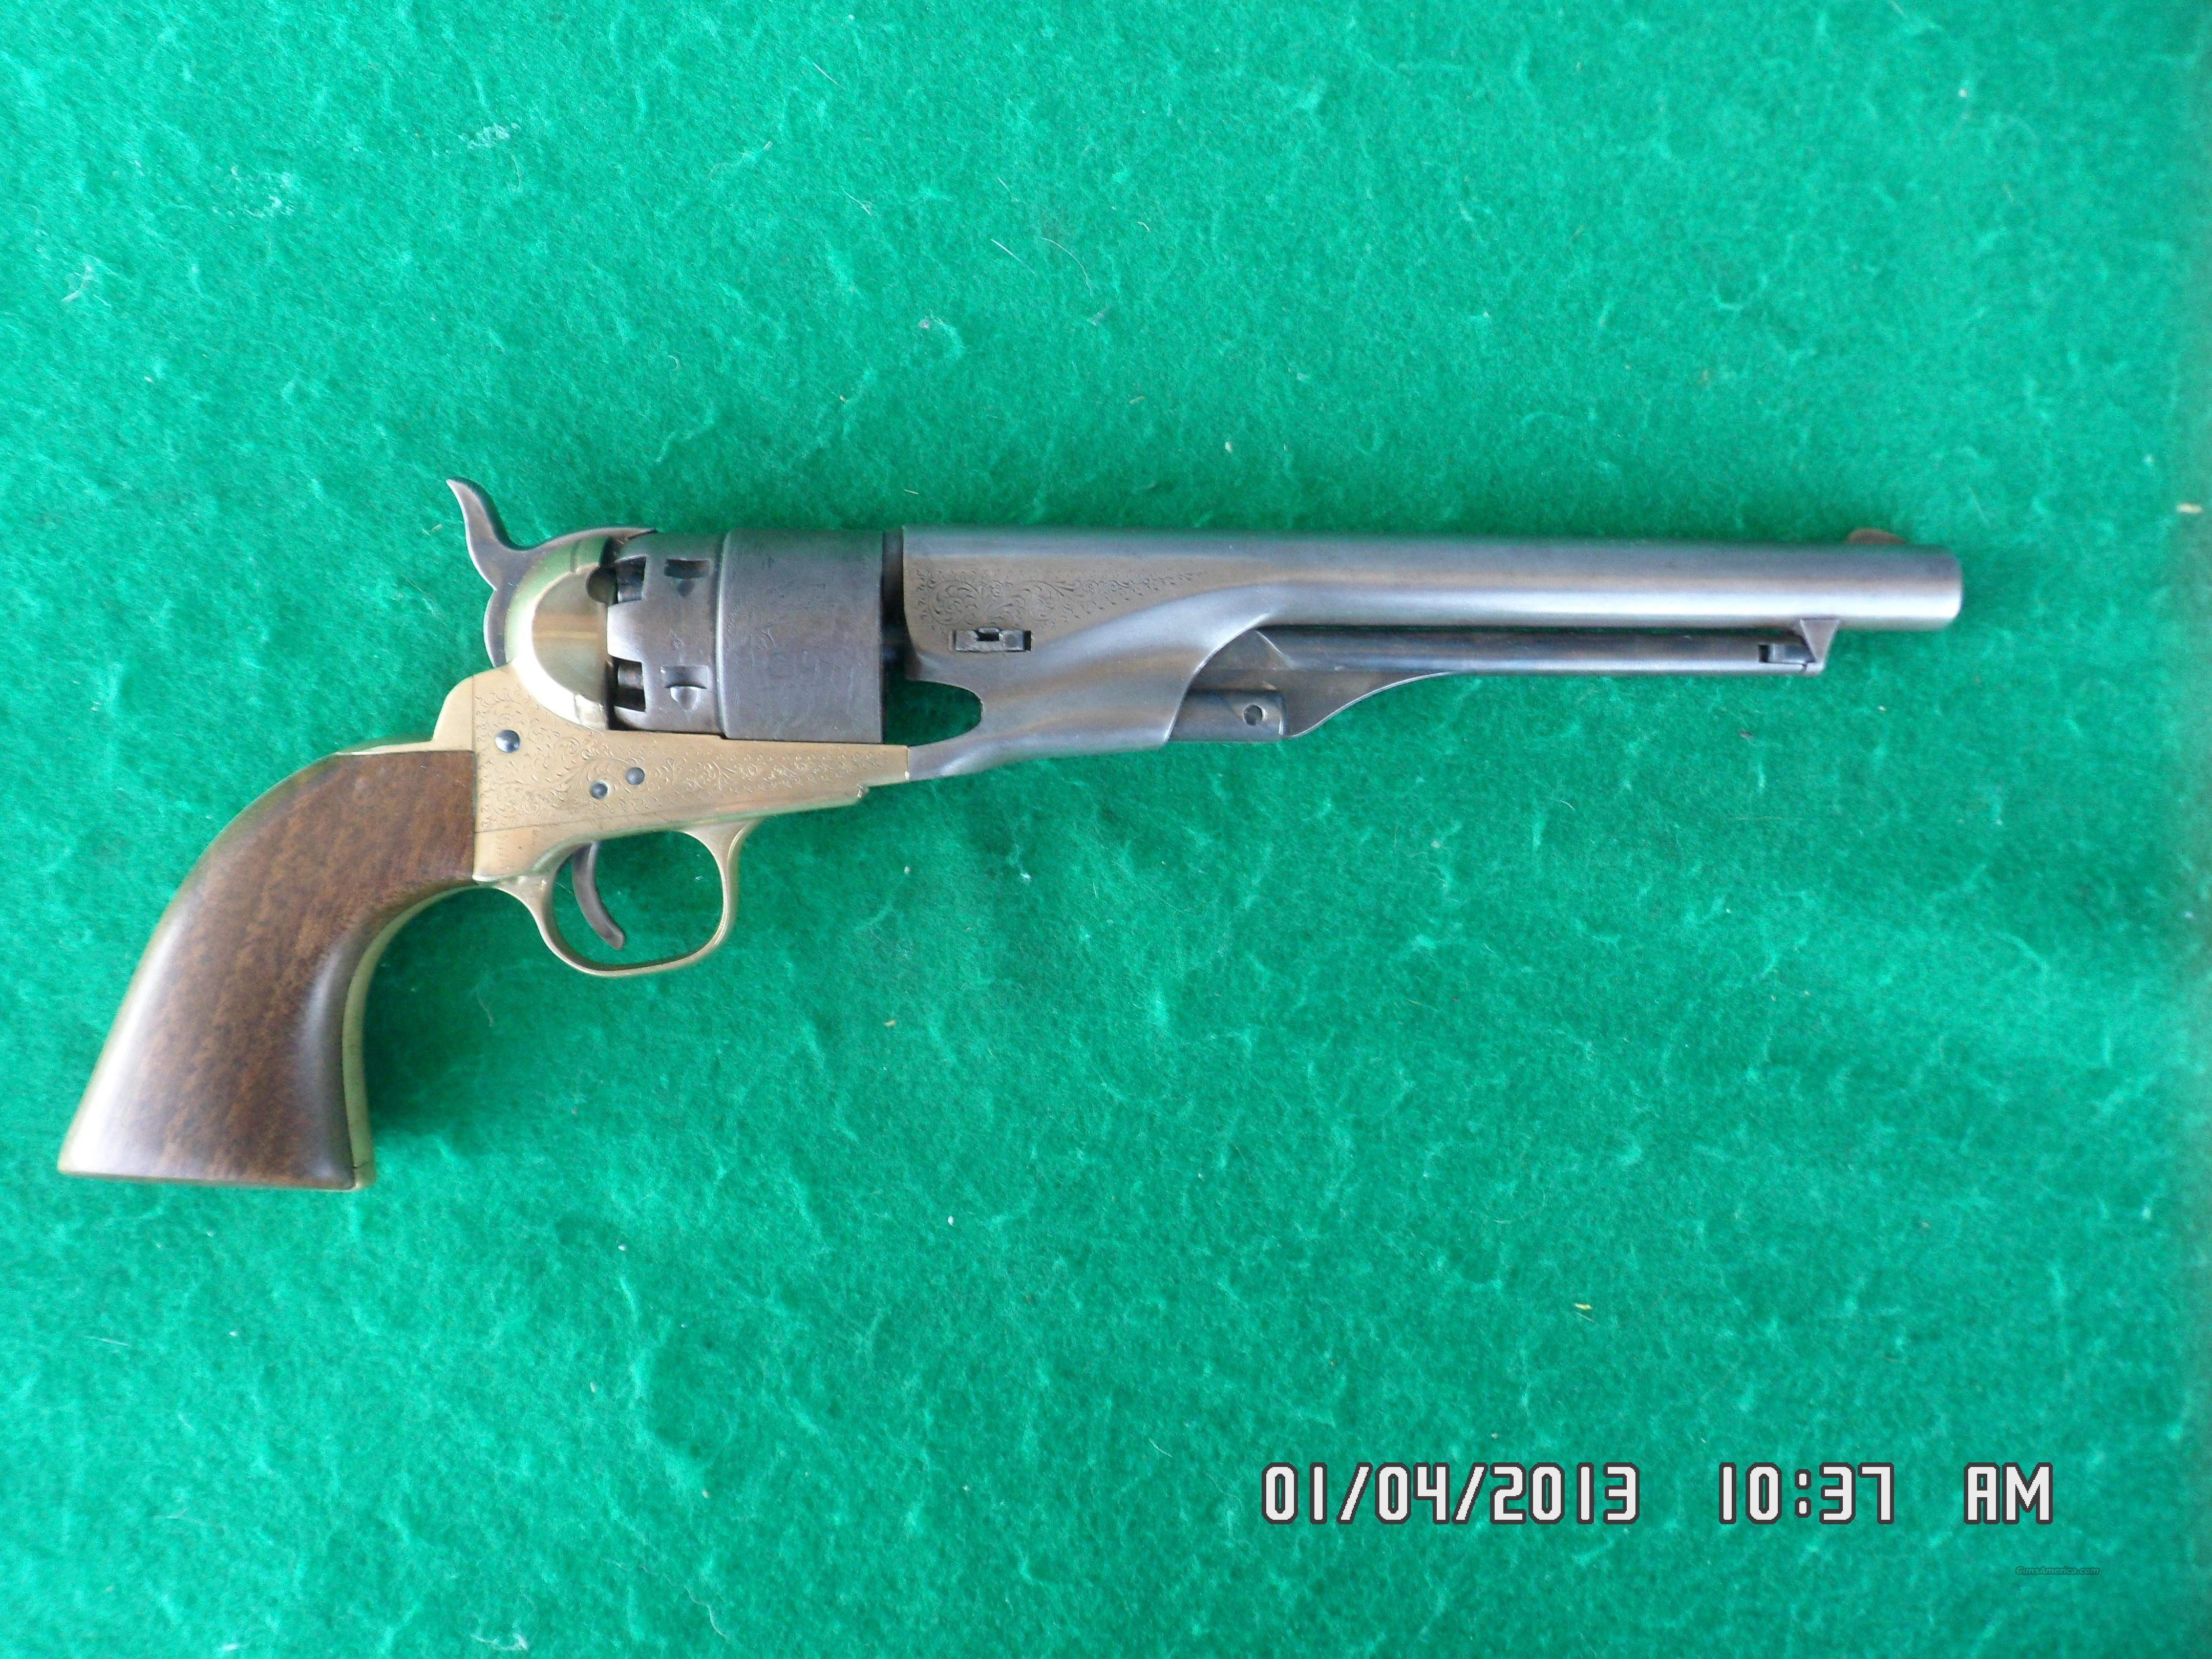 ARMI SAN MARCO /COLT 1860 ARMY REVOLVER ENGRAVE... for sale